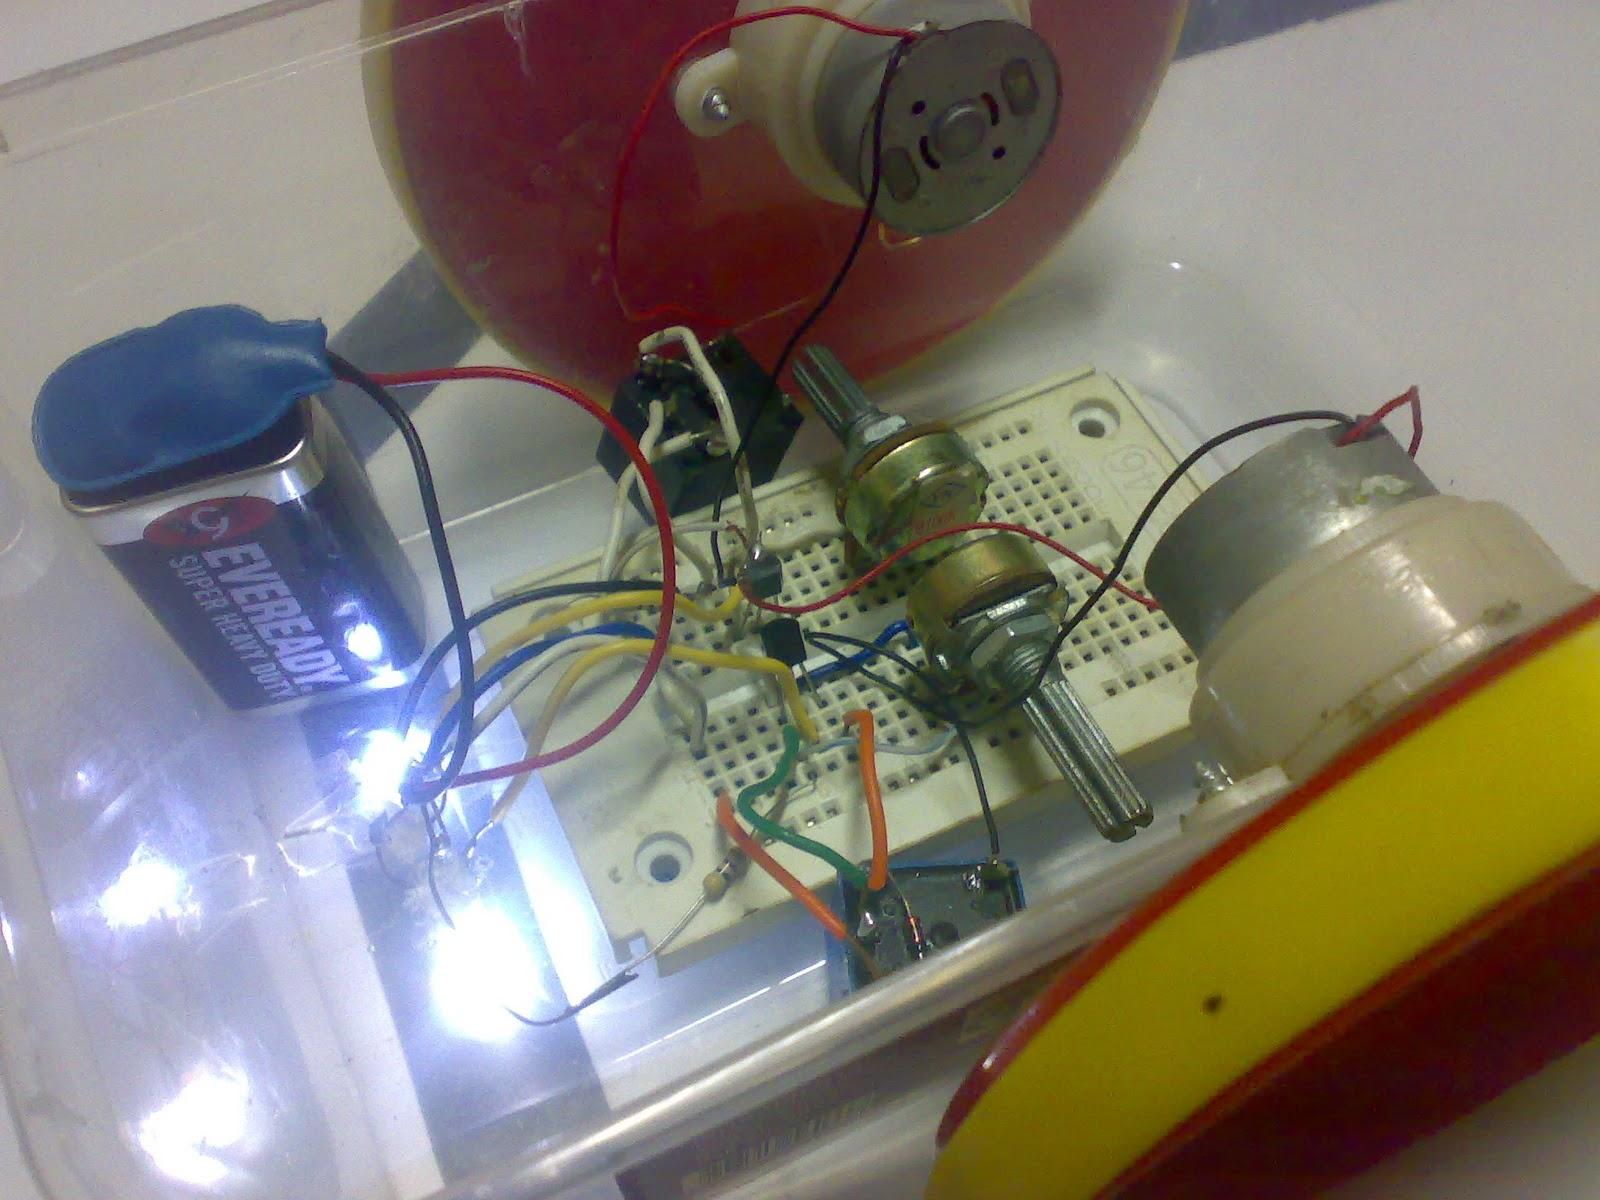 Circuit Desolator 2011 Wallpapers Quiz Buzzer Isometric View Of The Robot